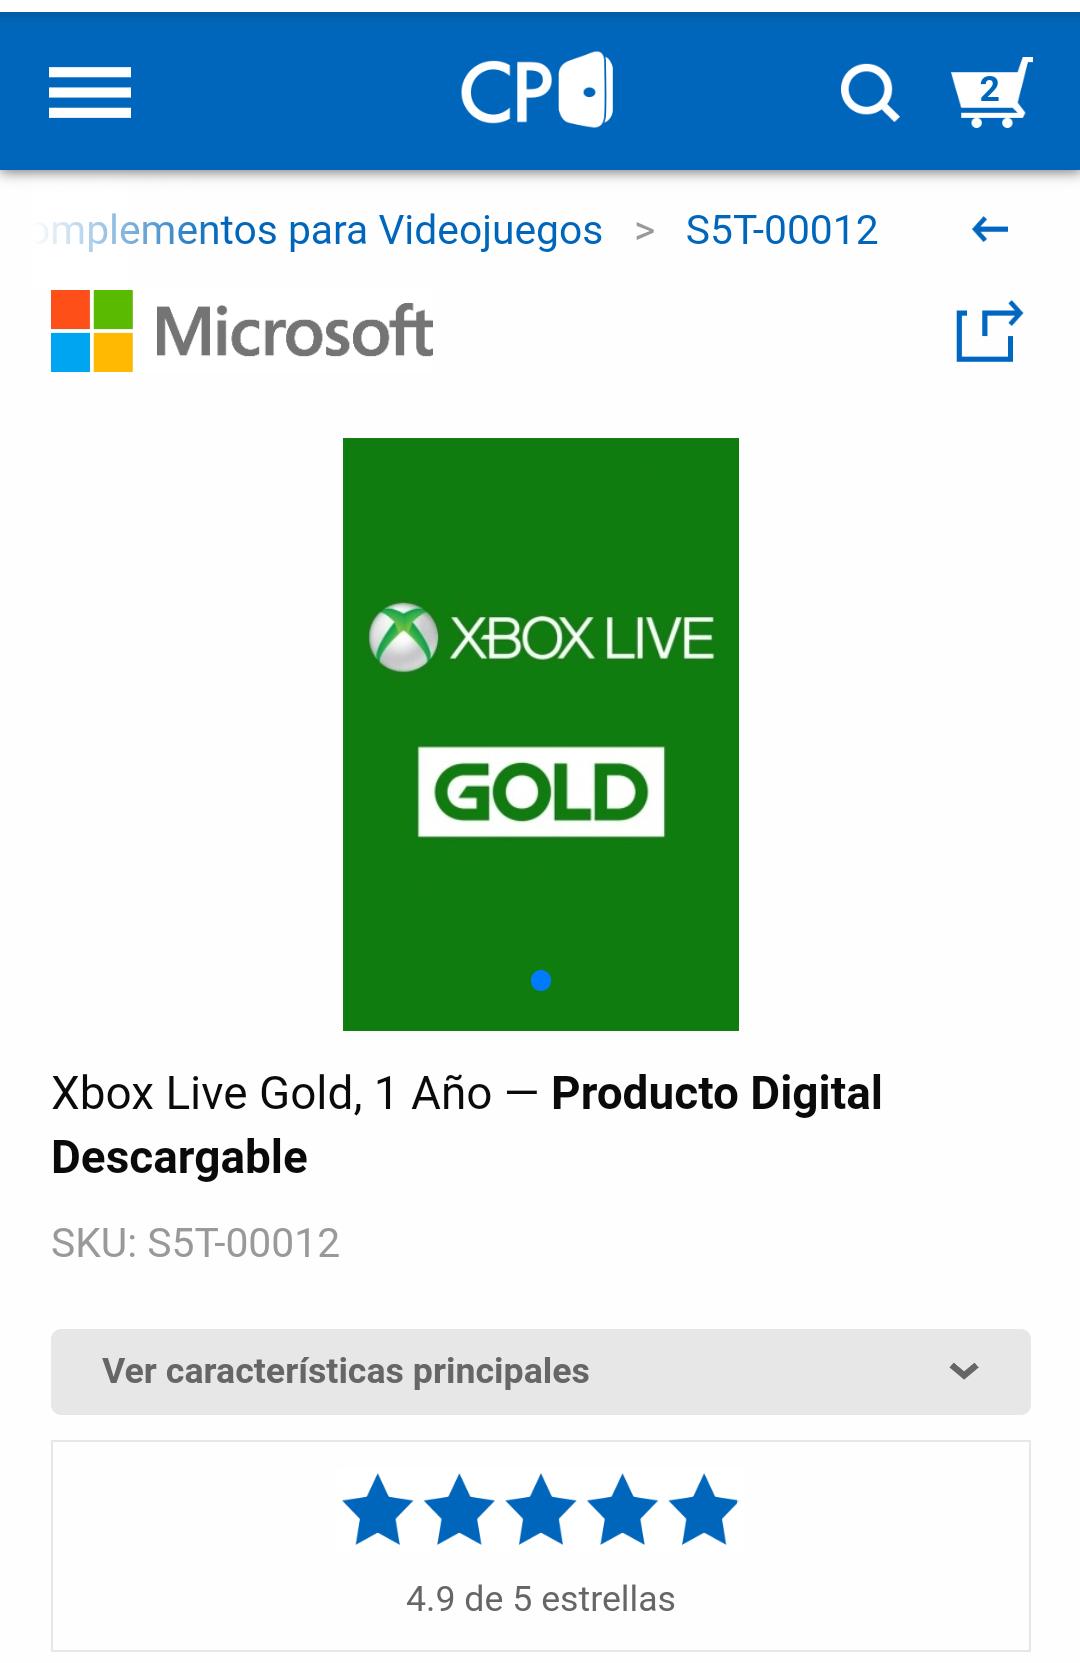 Cyberpuerta: Xbox Live Gold, 1 Año ― Producto Digital Descargable